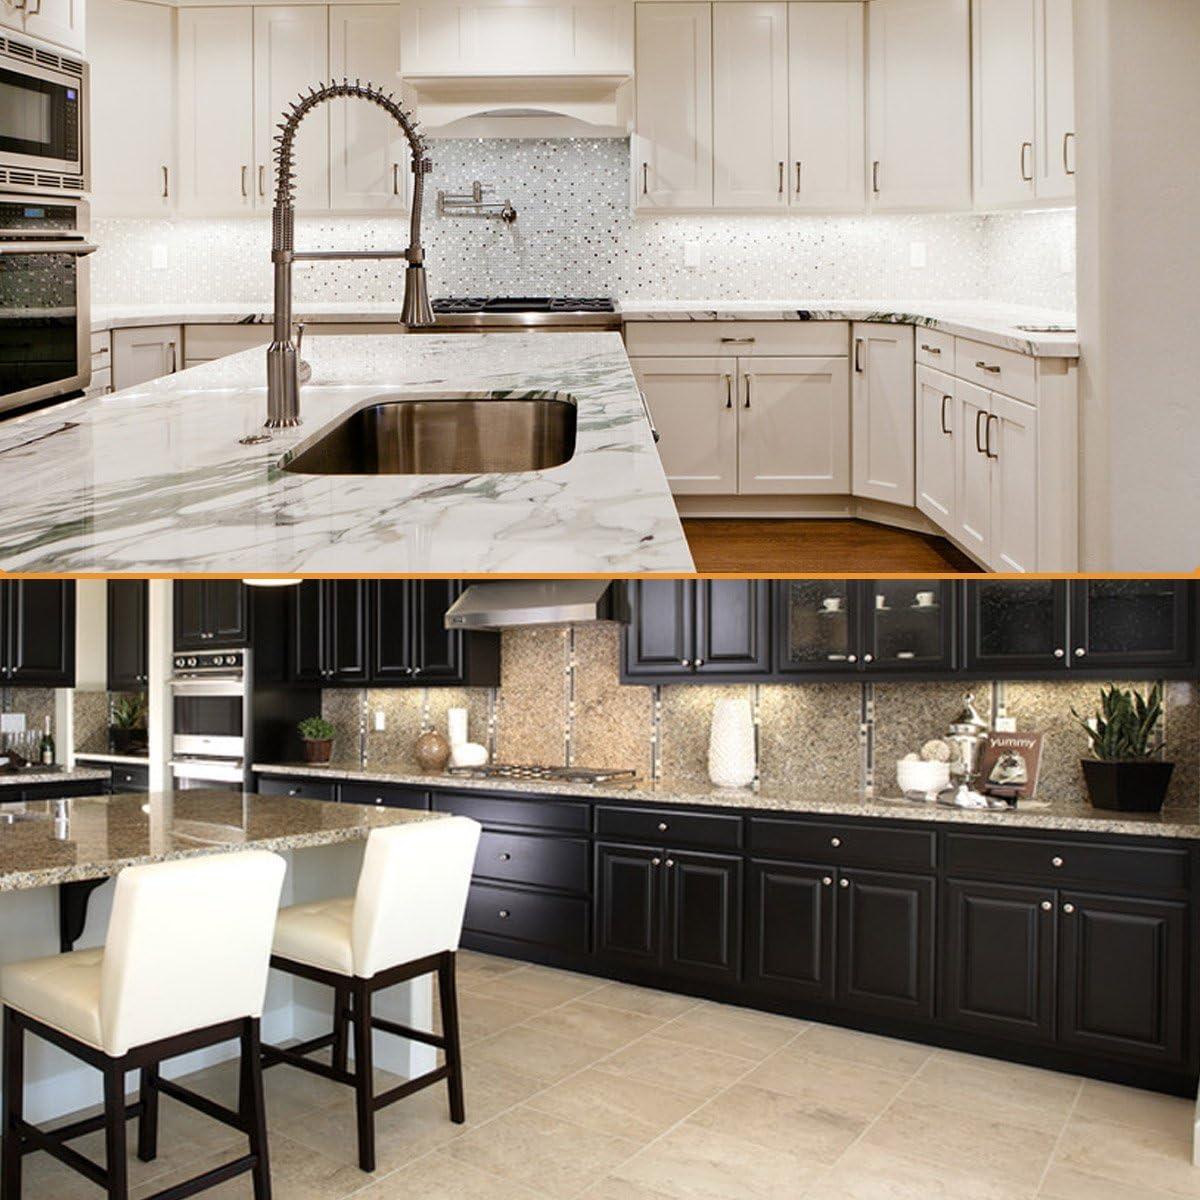 Litever Kitchen Under Cabinet LED Lighting Kits,3 PCS 1 ...